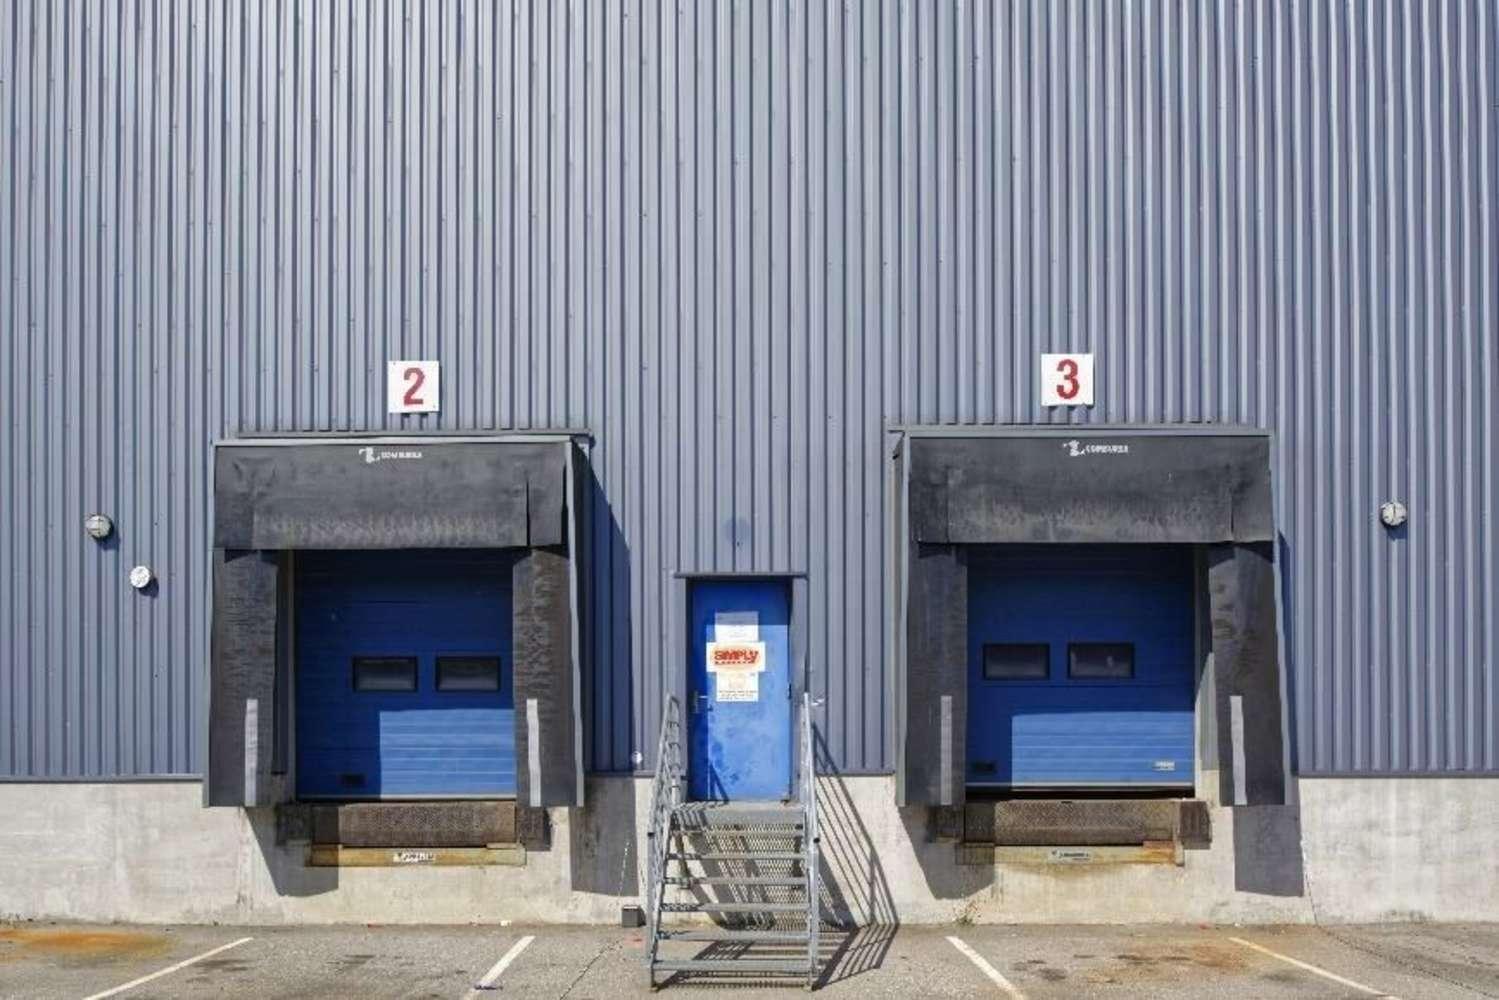 Plateformes logistiques St germain les arpajon, 91180 -  RUE HELENE BOUCHER - 10366844